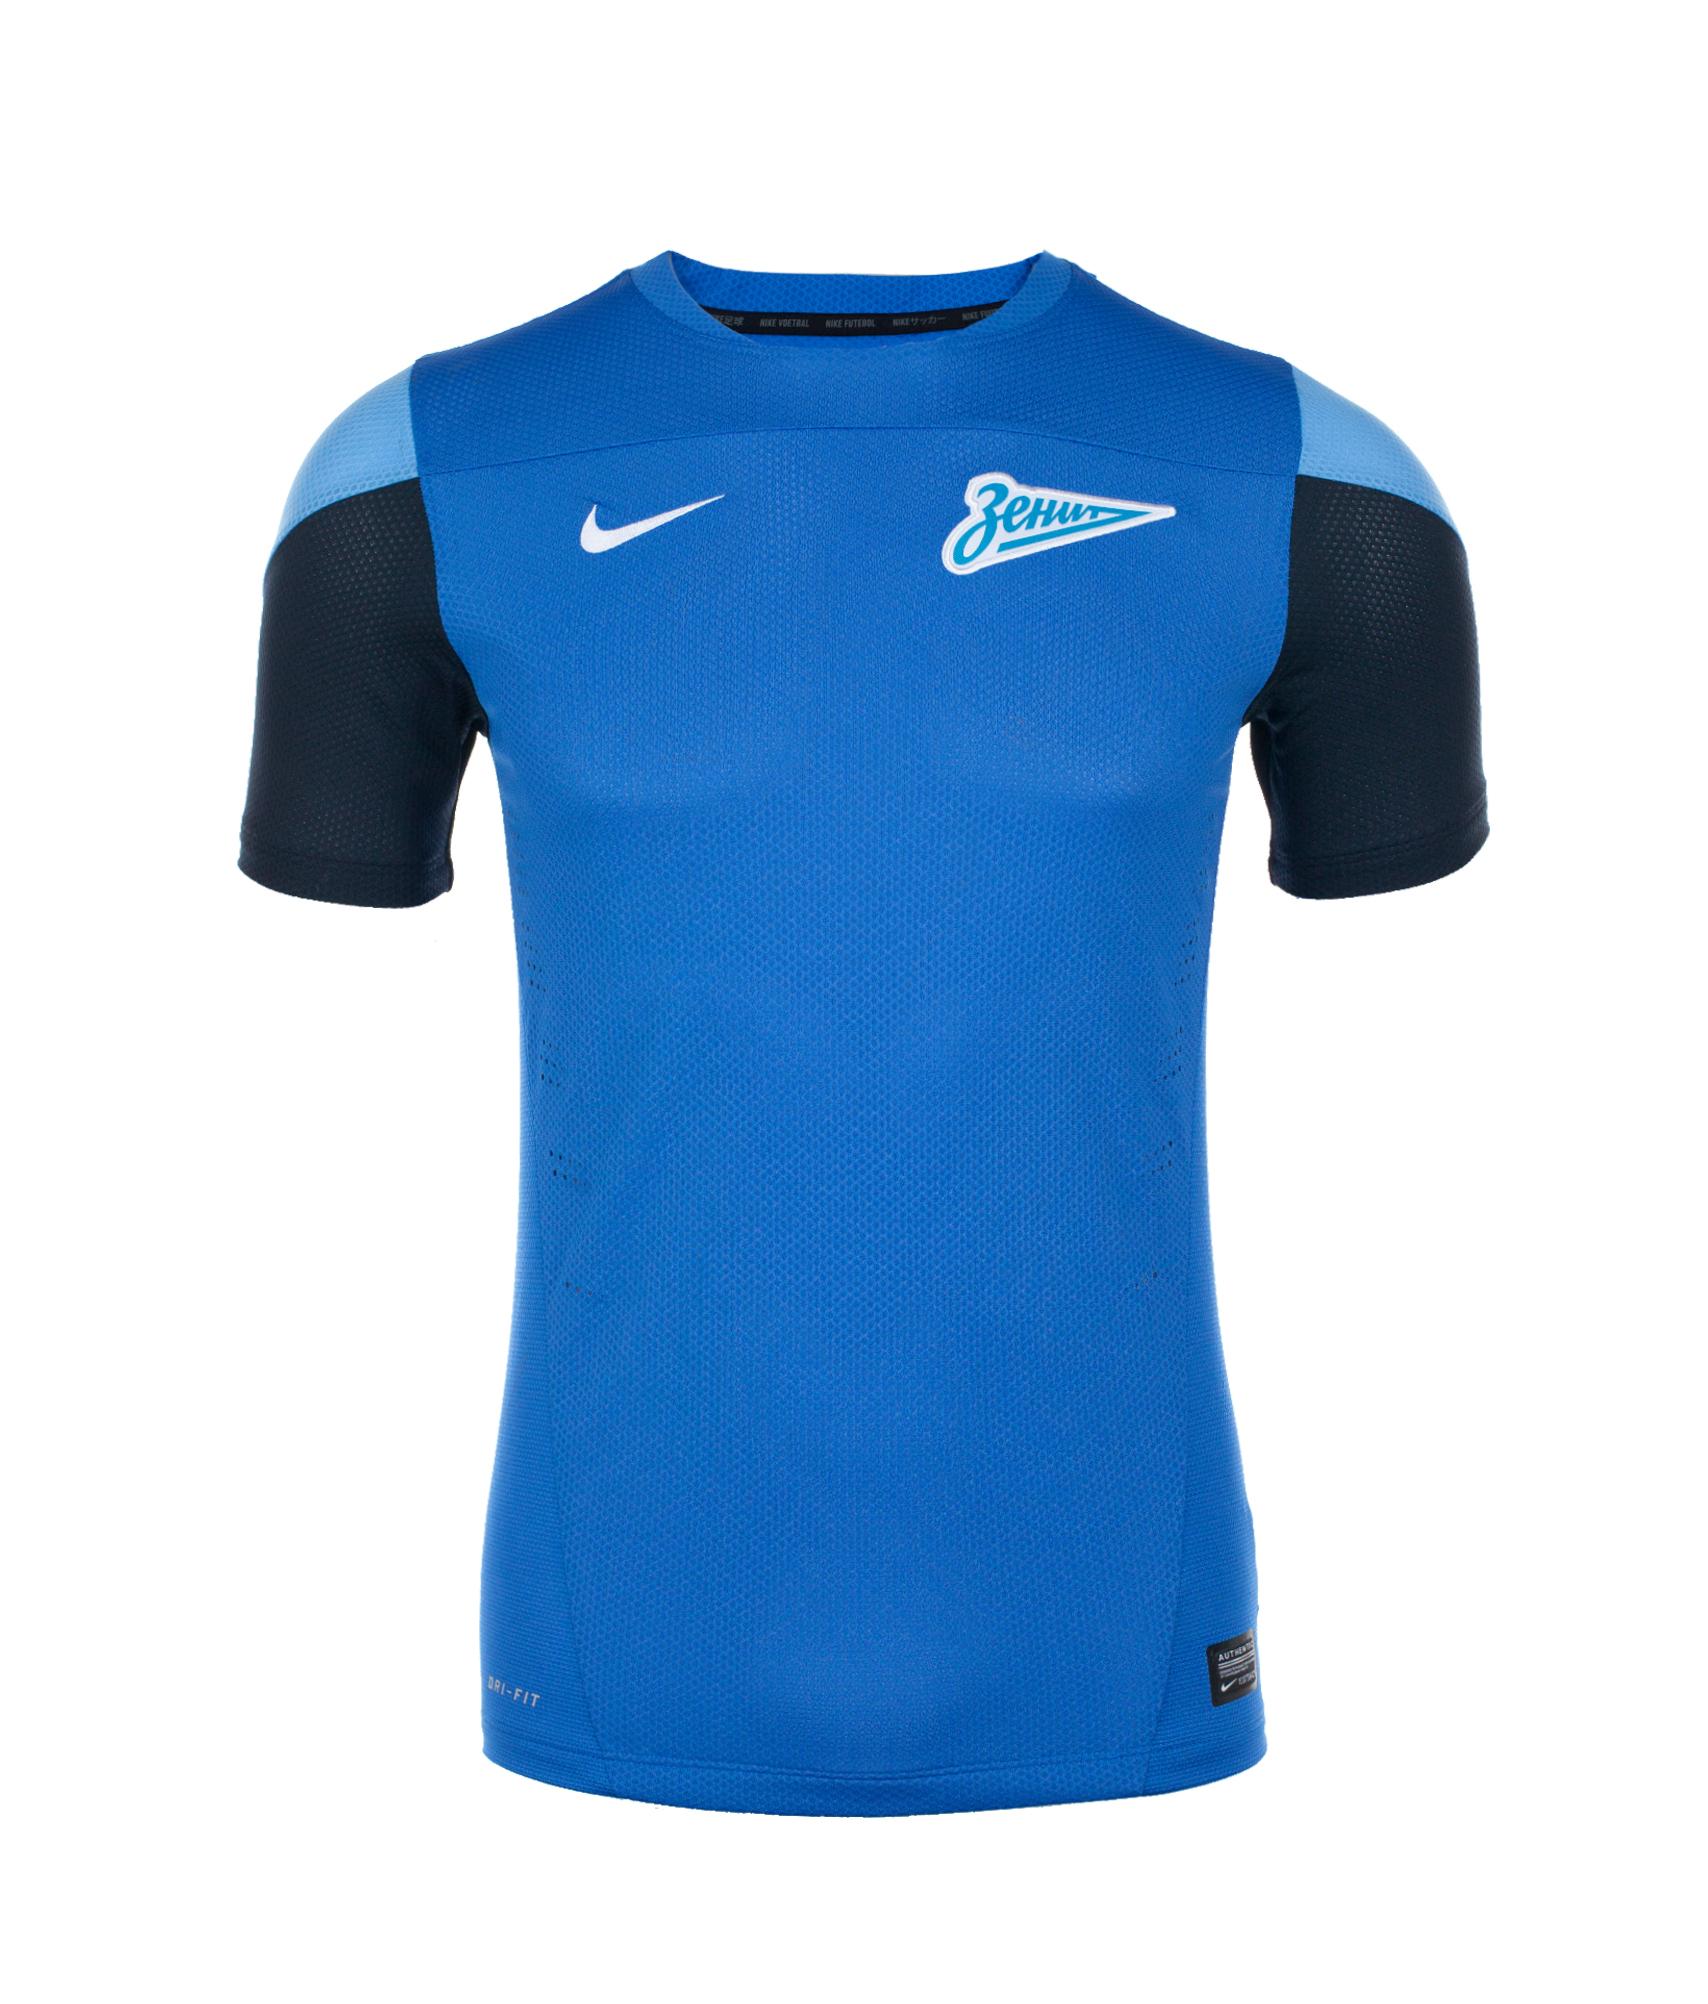 Футболка тренировочная Nike Zenit Select SS TRNG TOP, Цвет-Синий, Размер-L